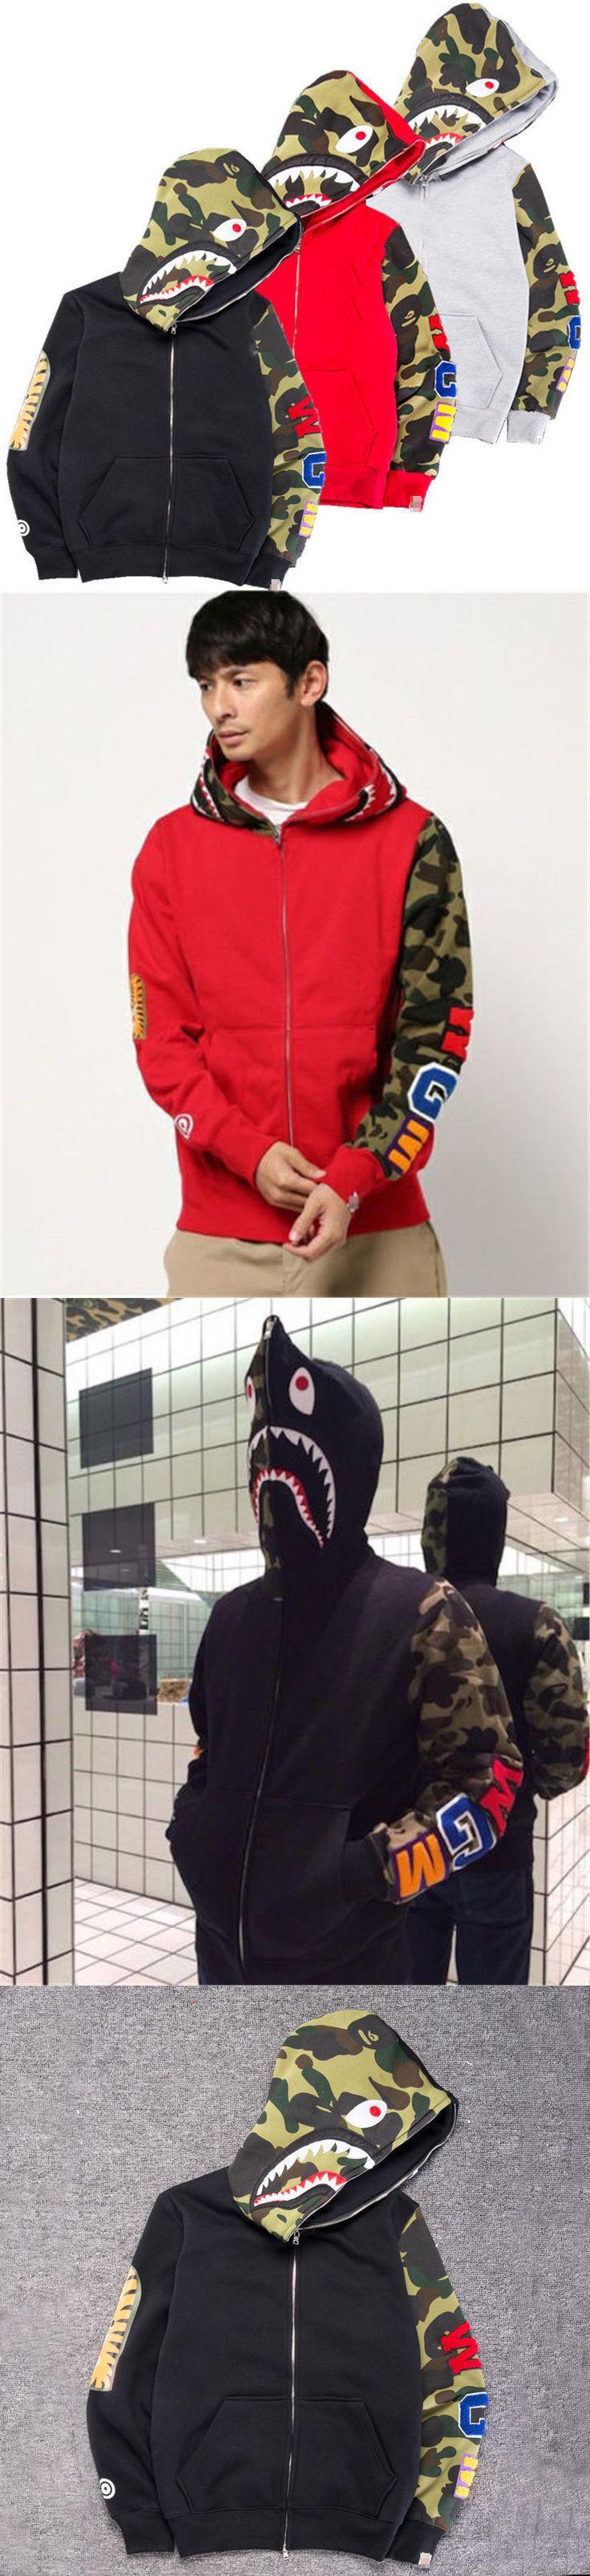 Sweats and Hoodies 155183: Hot Bape A Bathing Ape Men S Jacket Shark Head Full Zip Hoodie Sweater Coat -> BUY IT NOW ONLY: $37.59 on eBay!